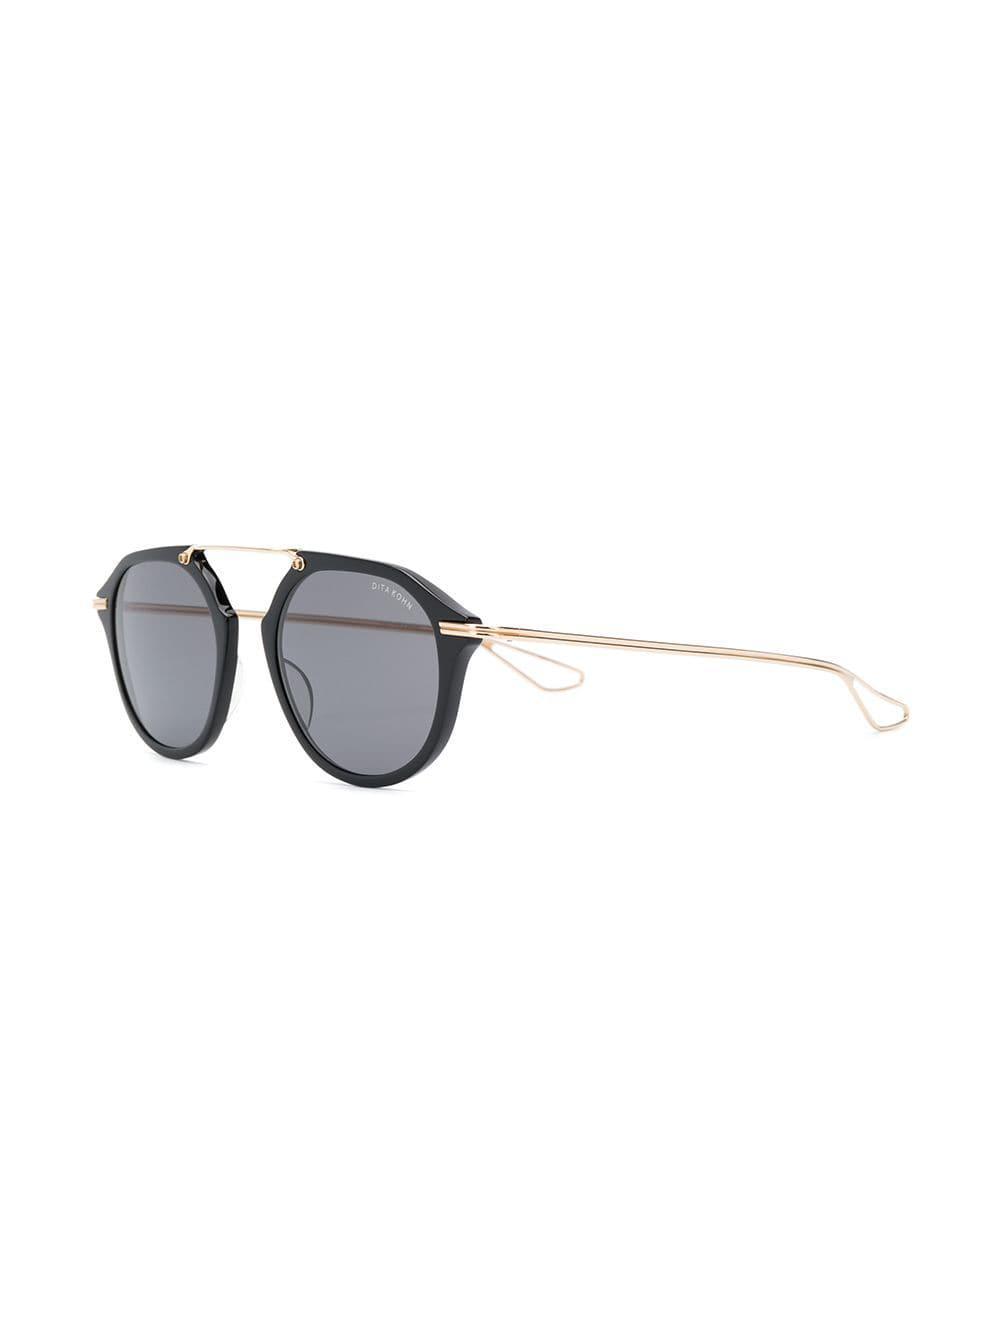 1a38fa4f5480 Dita Eyewear - Black Round Tinted Sunglasses - Lyst. View fullscreen